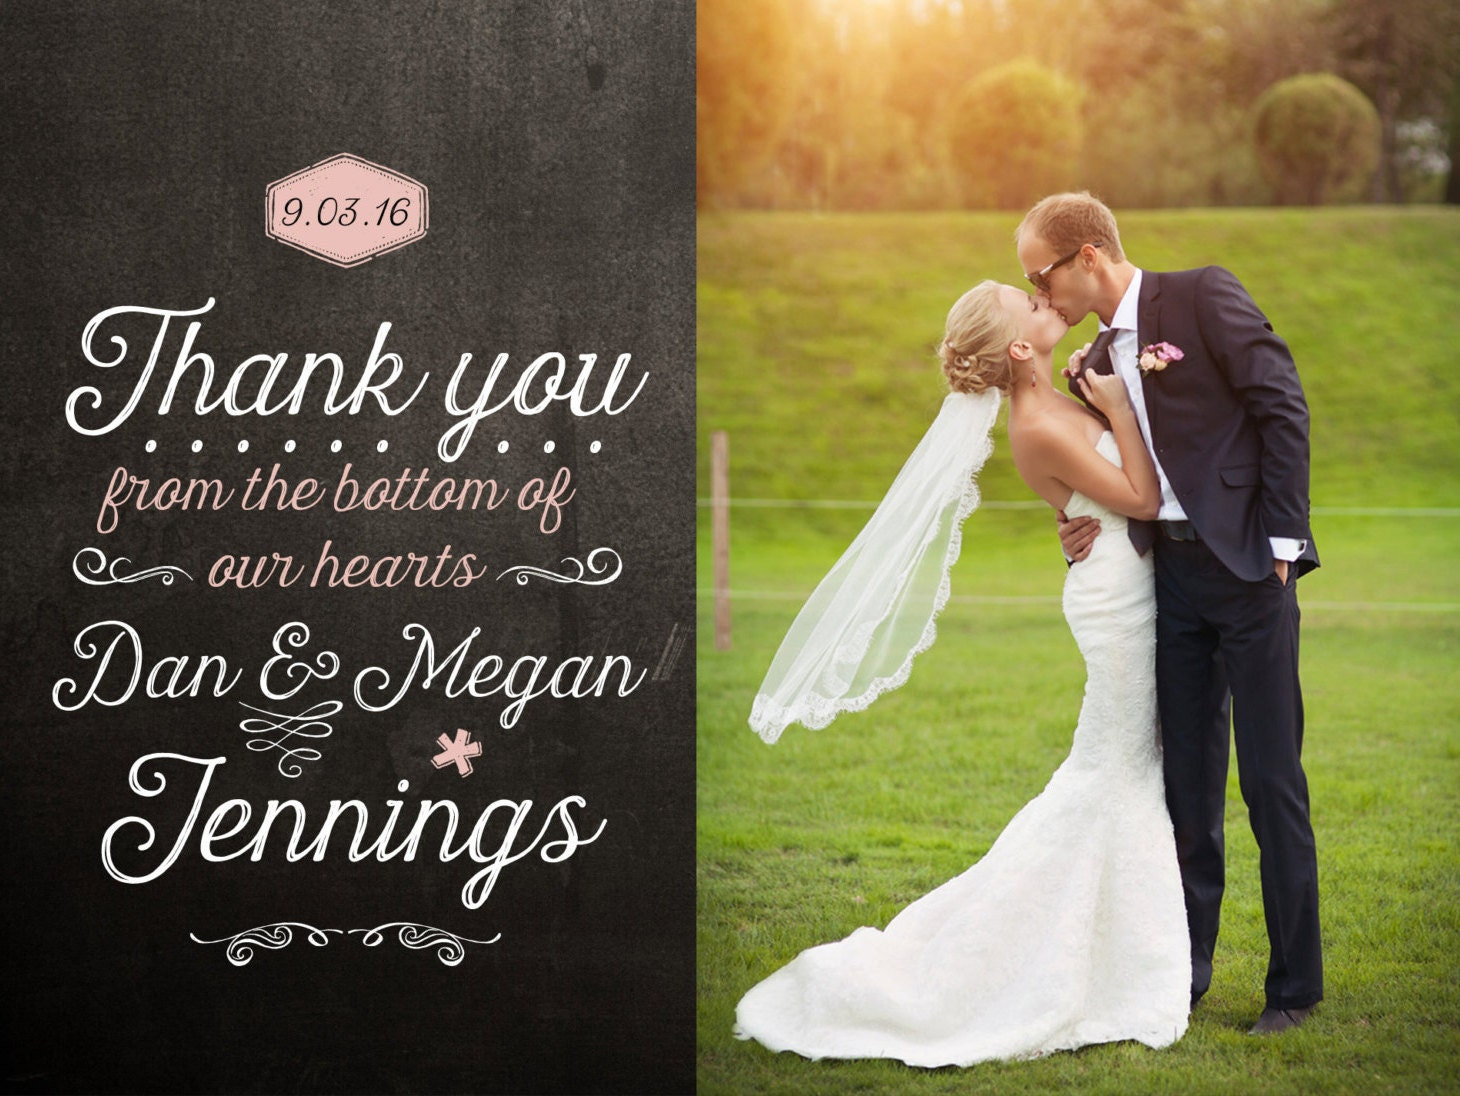 blackboard wedding thank you card design thank you cards wedding Blackboard Wedding Thank You Card Design zoom